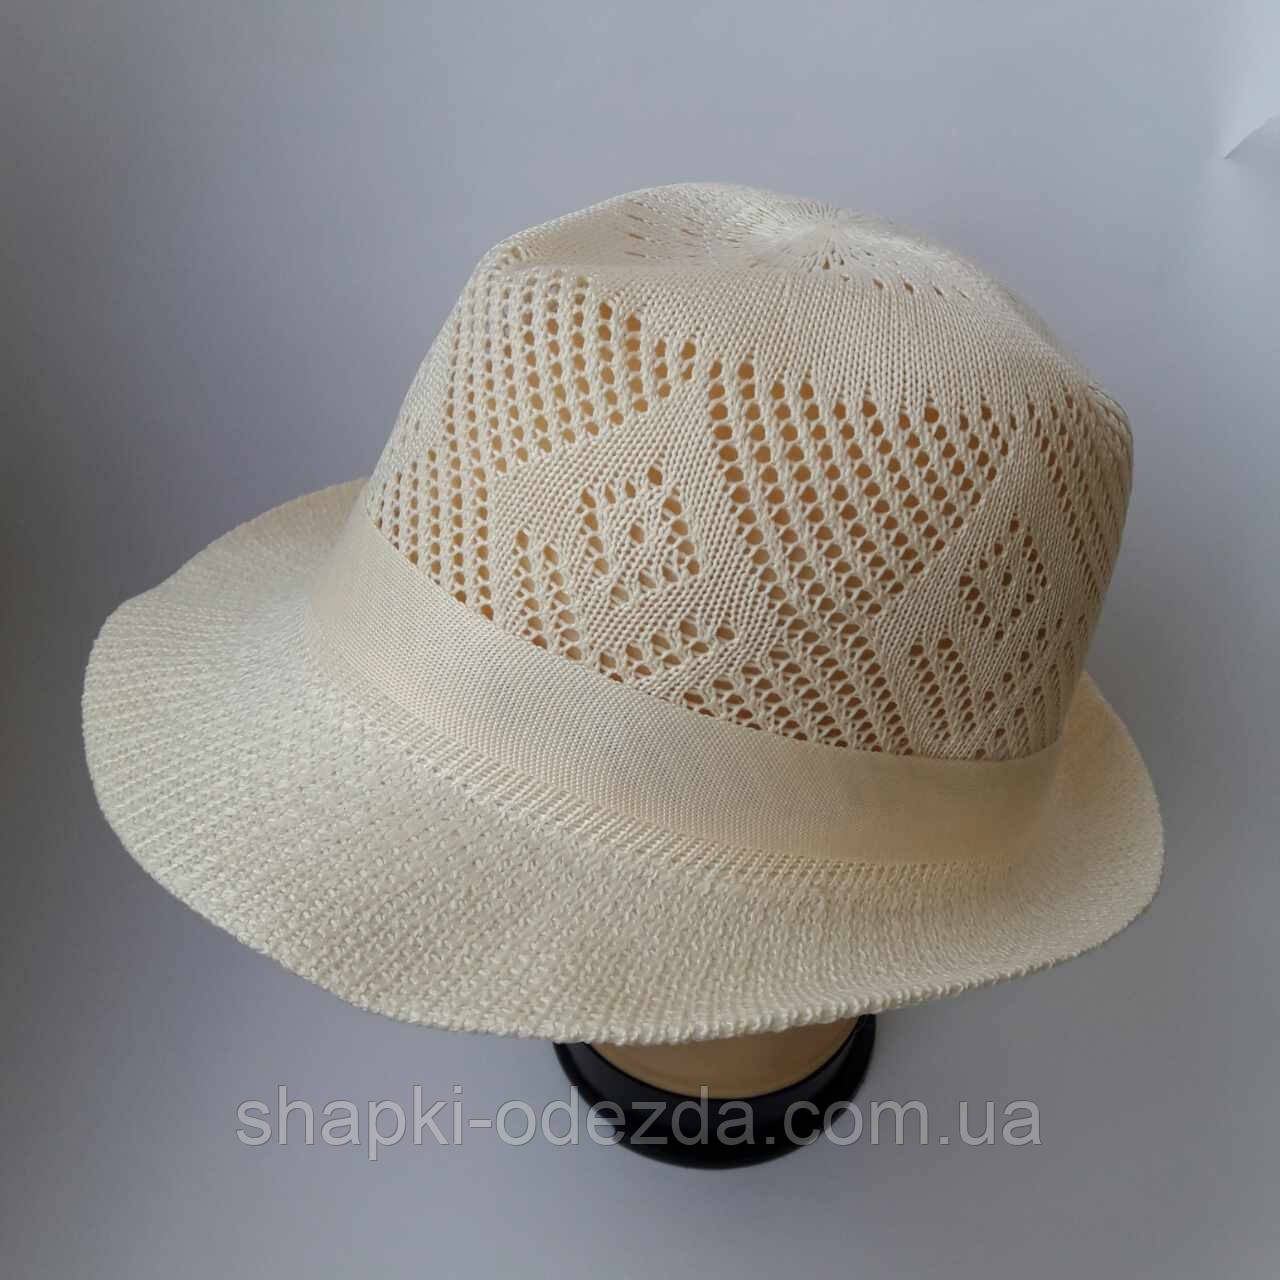 Шляпа молодежная челинтано Размер 58